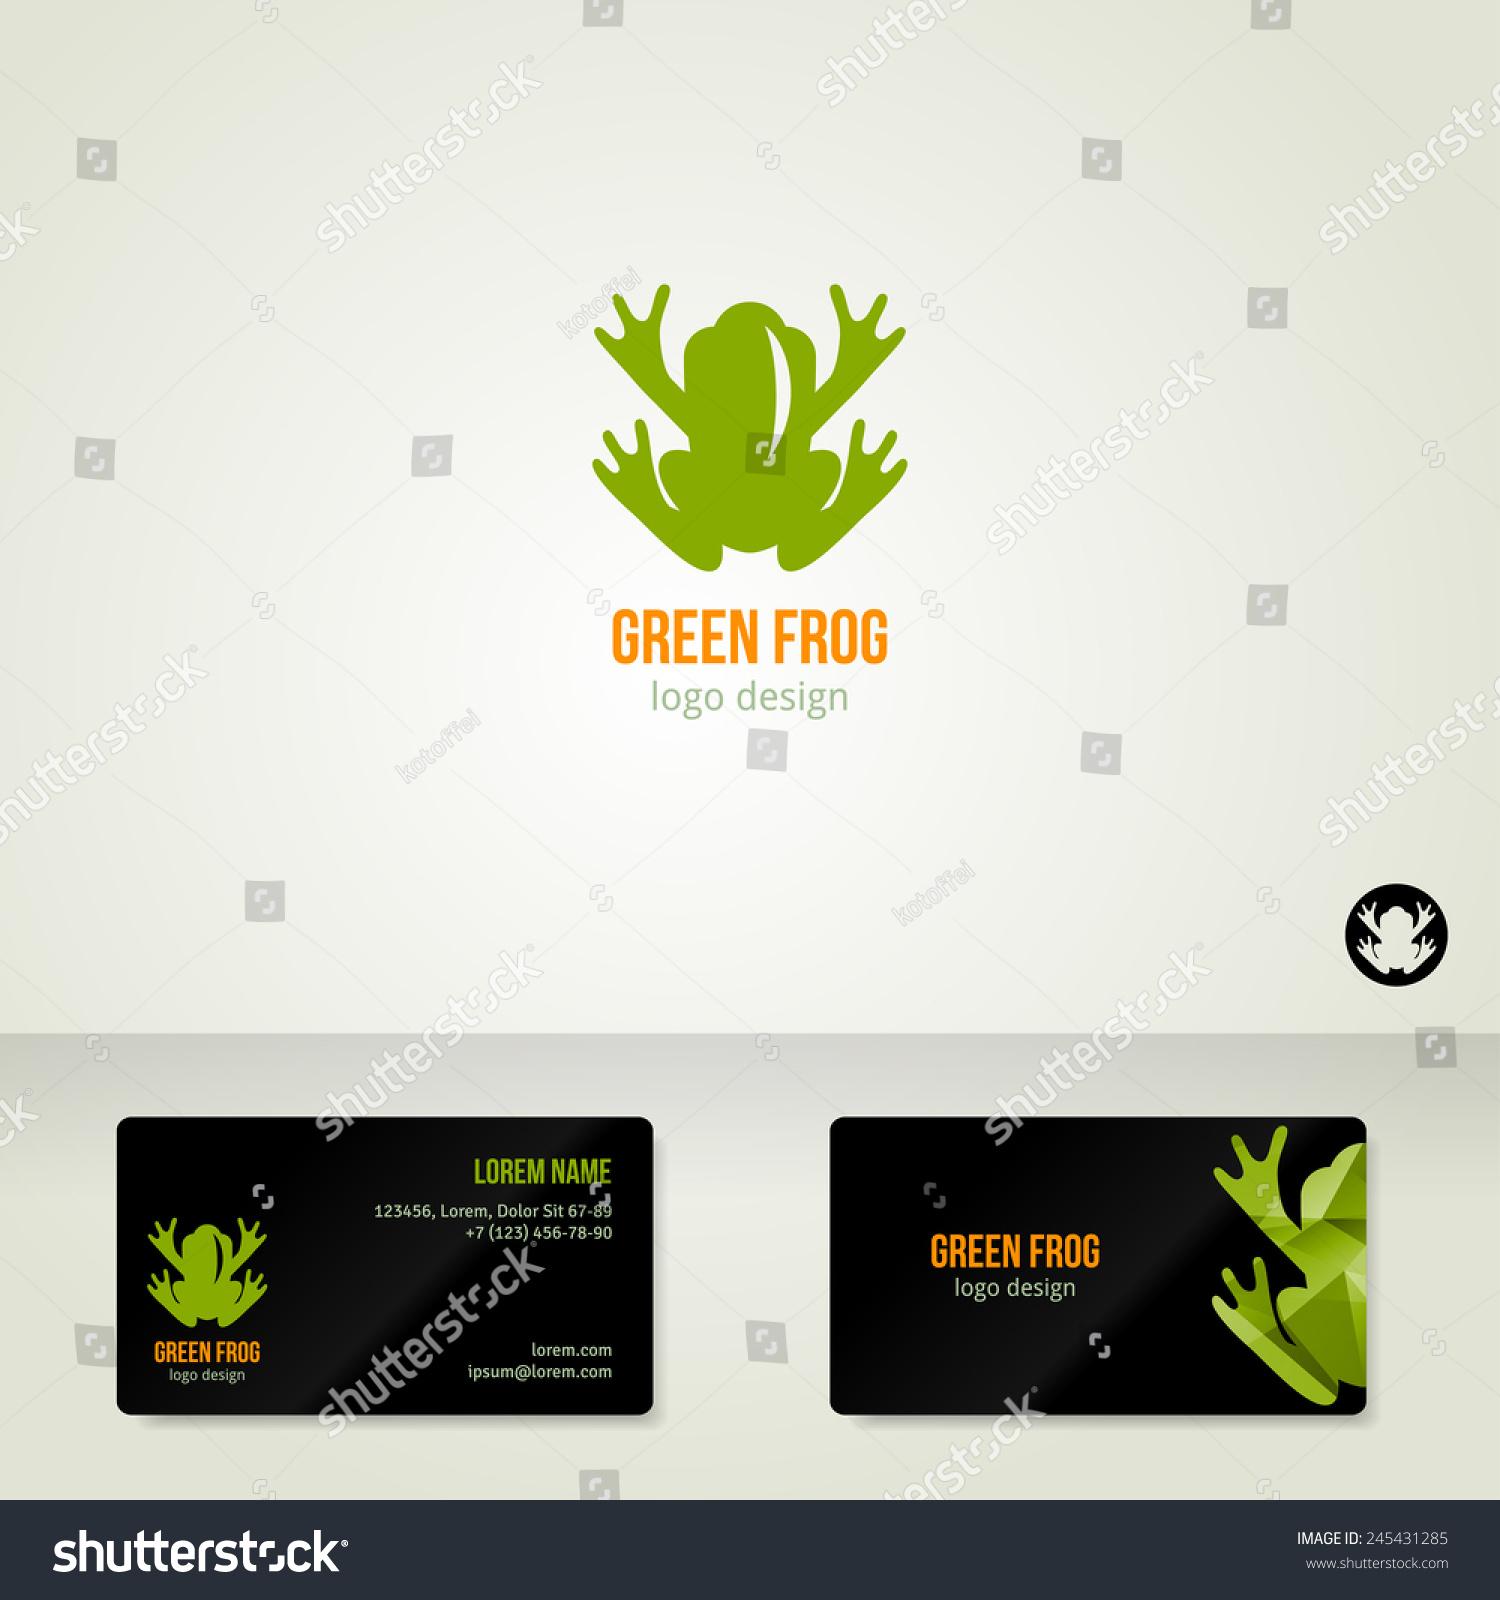 Logo Design Green Frog Vector Illustration Stock Photo (Photo ...